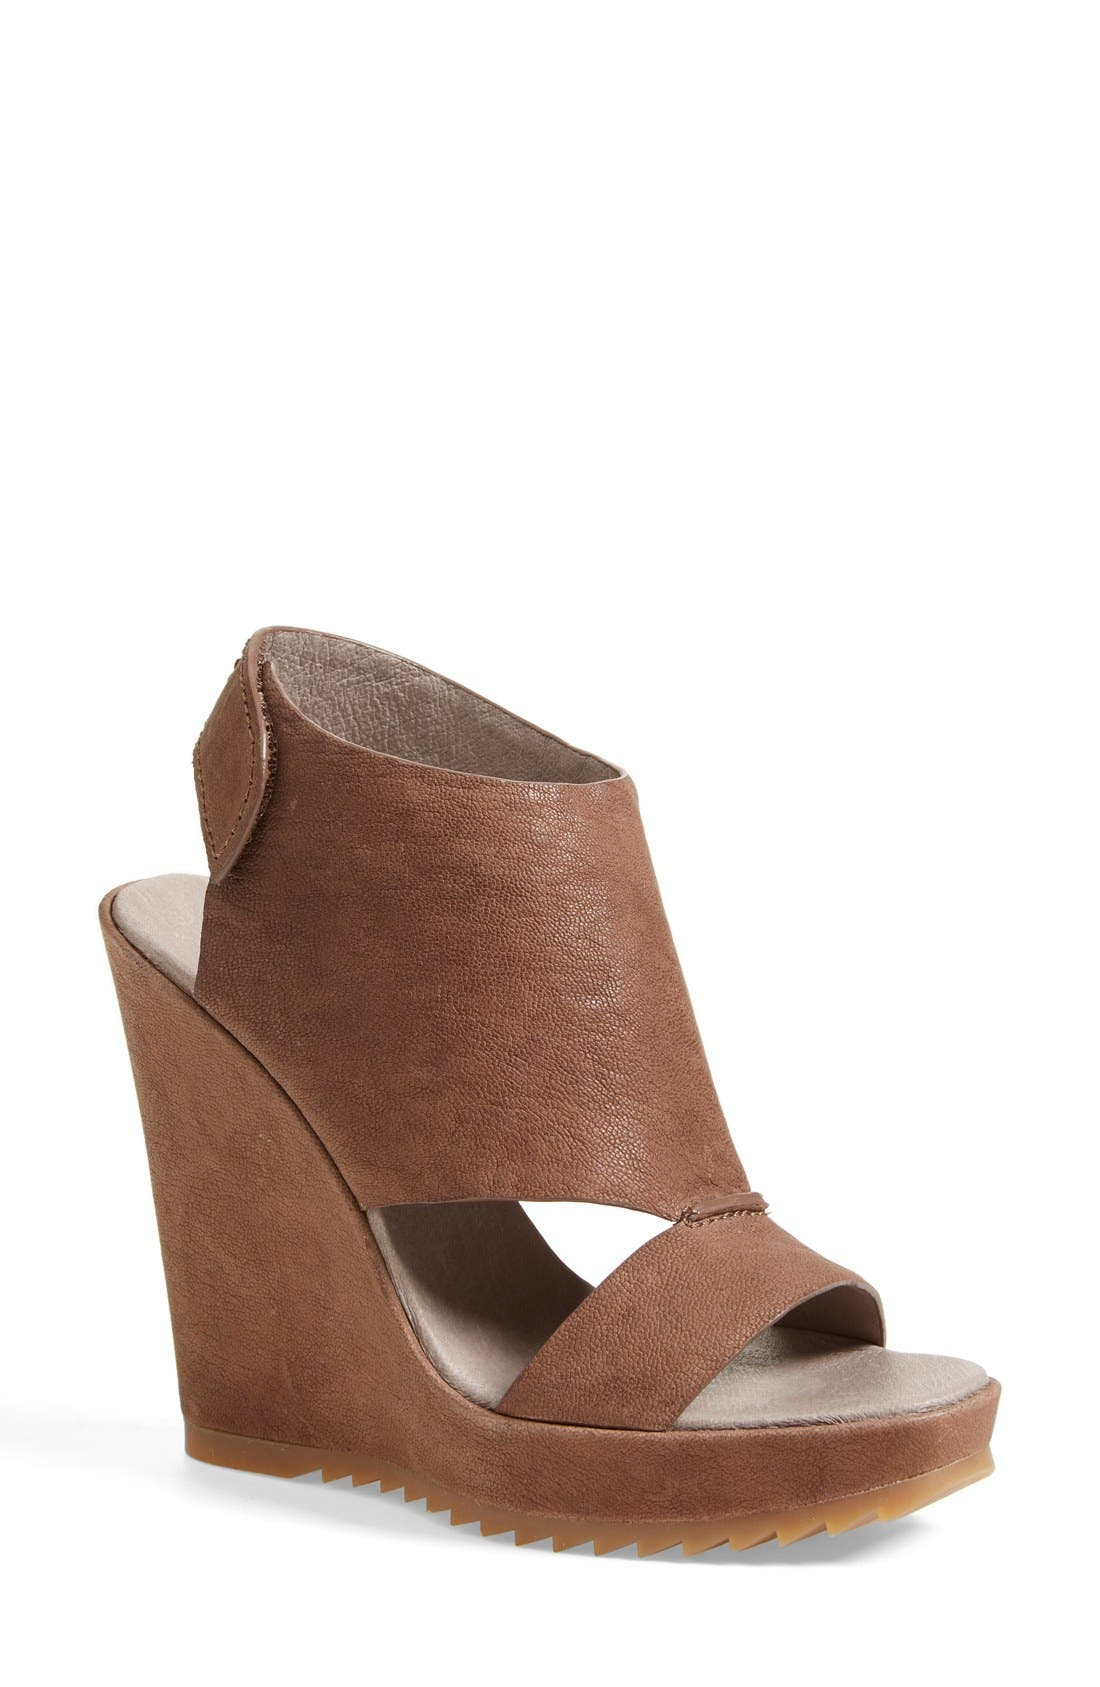 Alternate Image 1 Selected - Vince Camuto 'Gevara' Leather Platform Wedge (Women)